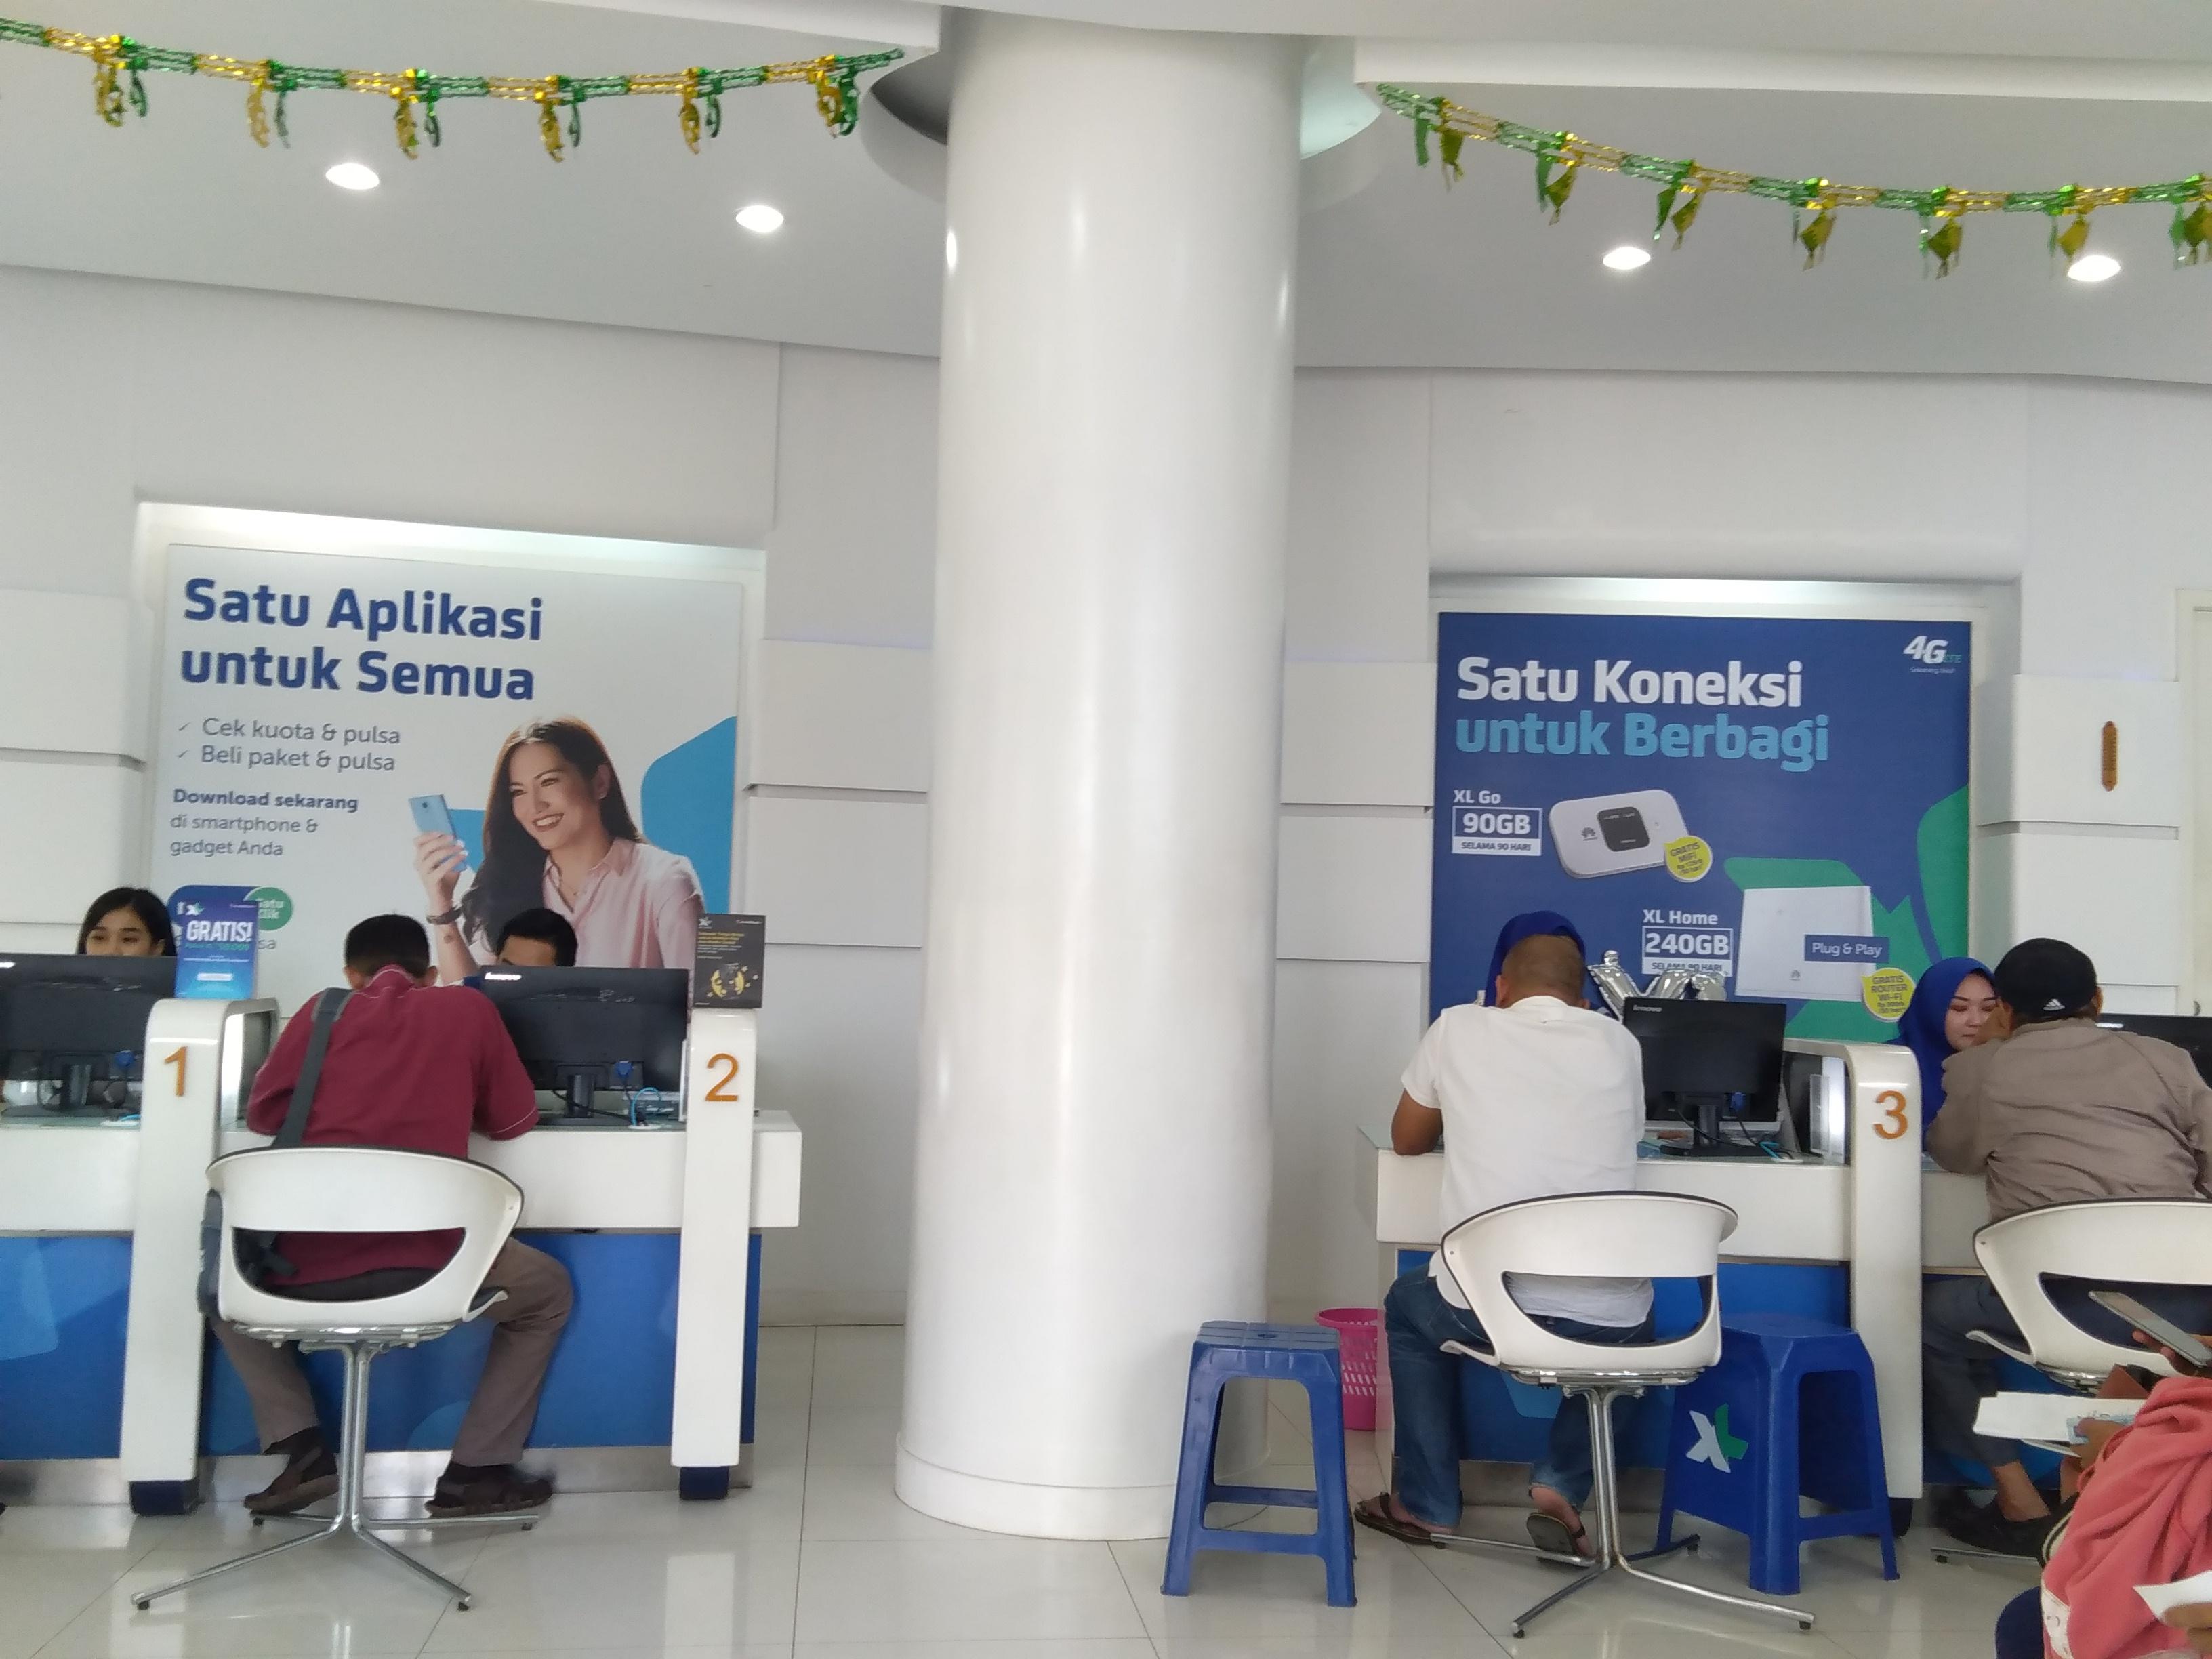 XL Center Serang, Banten